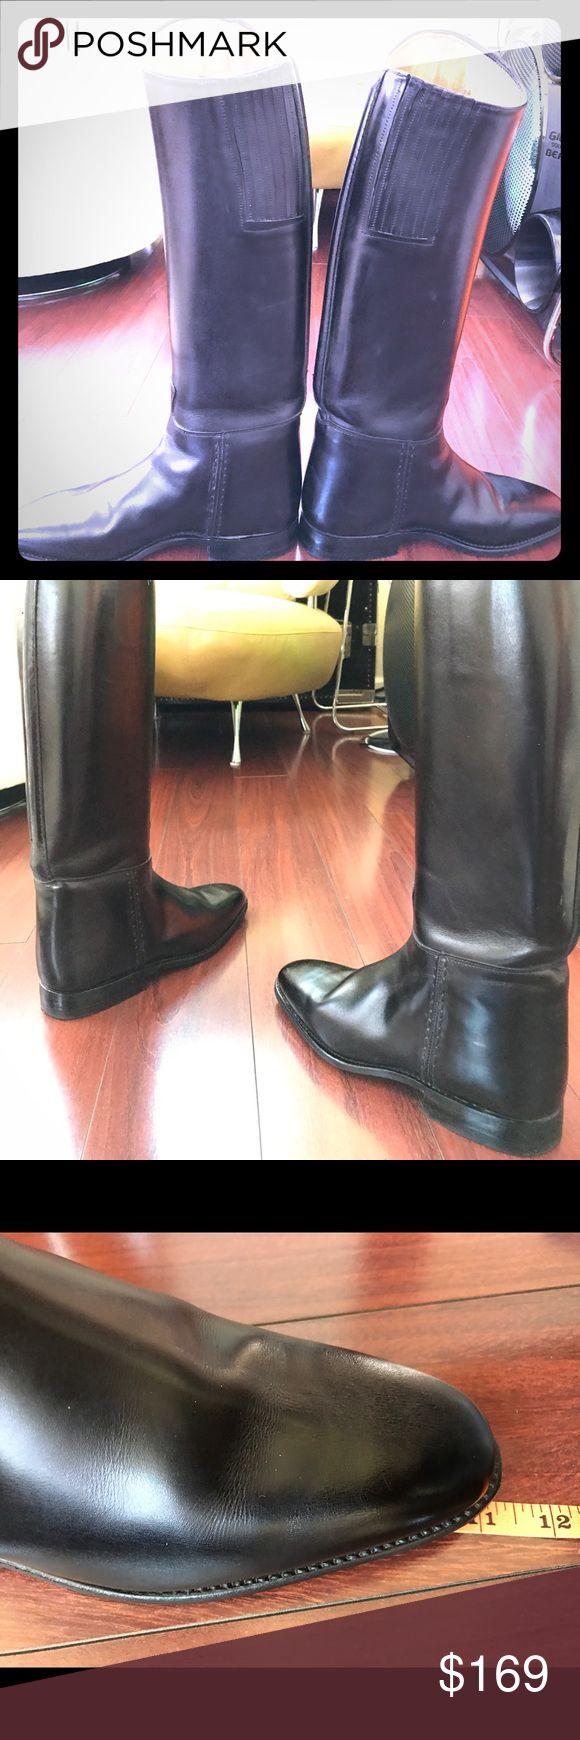 Schön Konig Dressage Boots 9 Womenu0027s Slim Calf